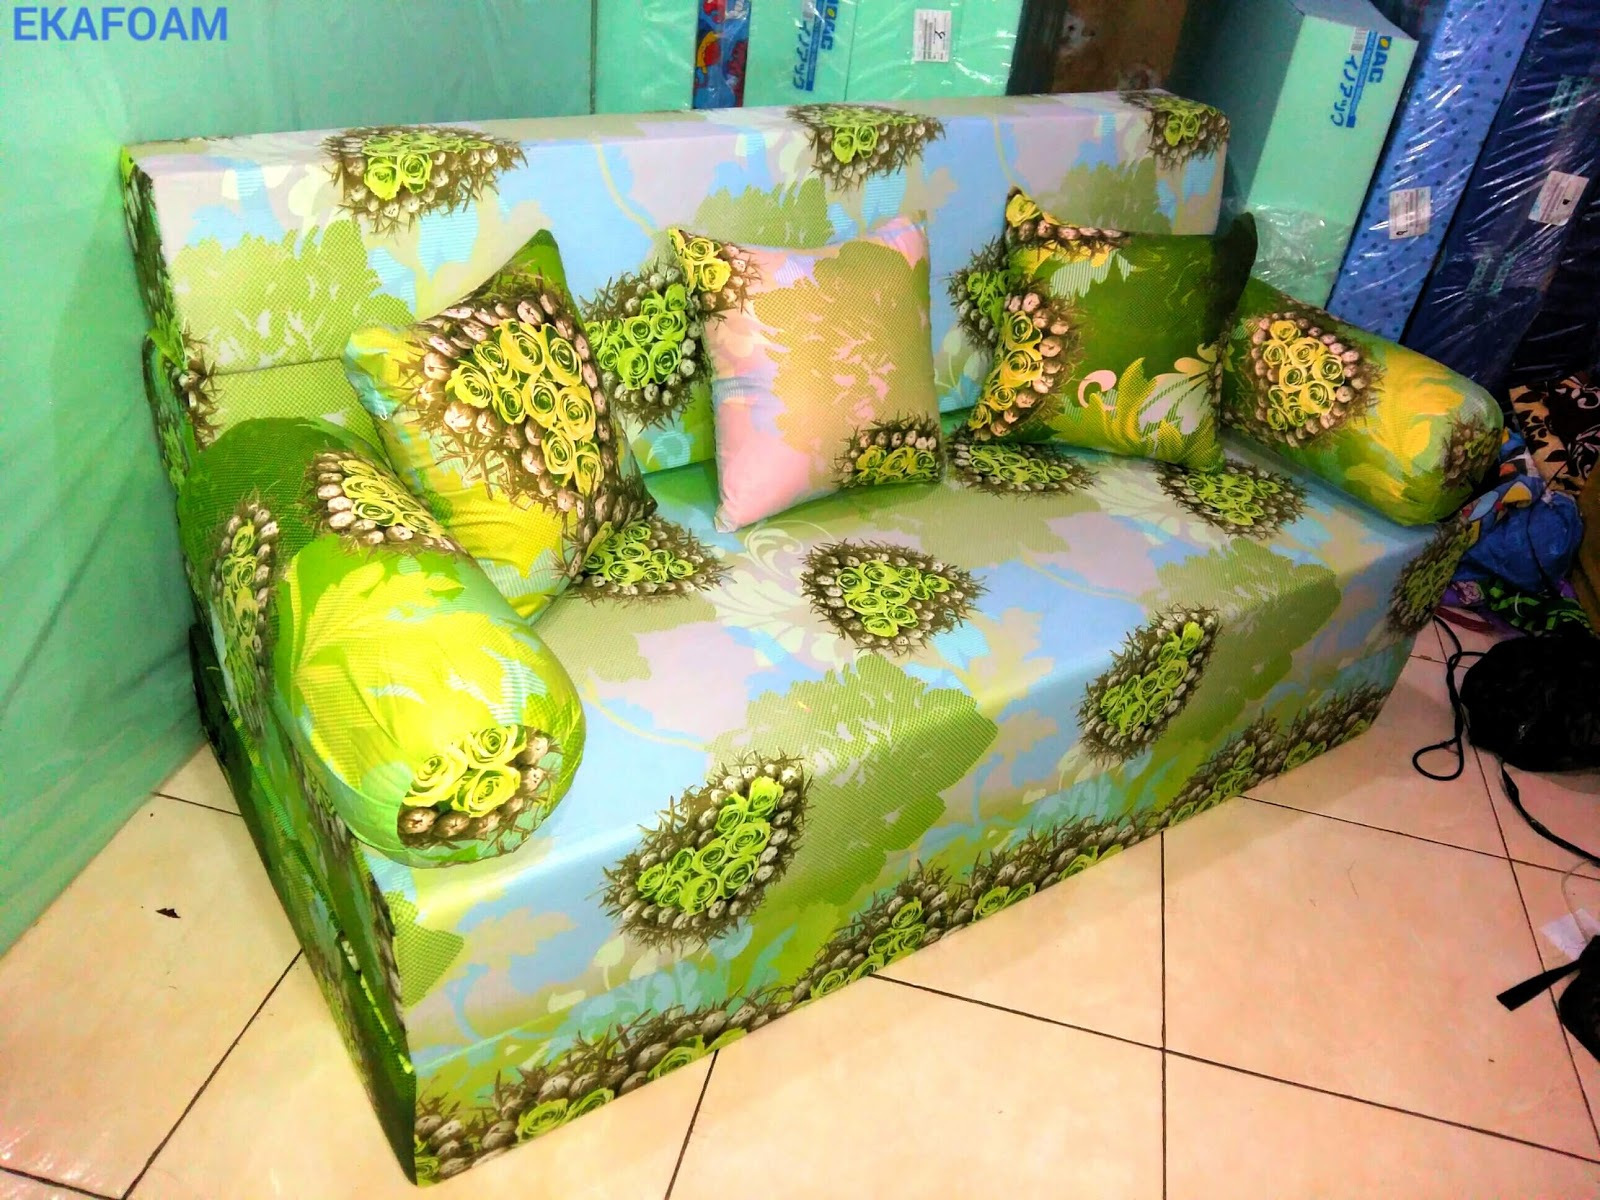 sofa bed inoac 3 in 1 leopard print and loveseat 2017 full motif agen resmi kasur busa